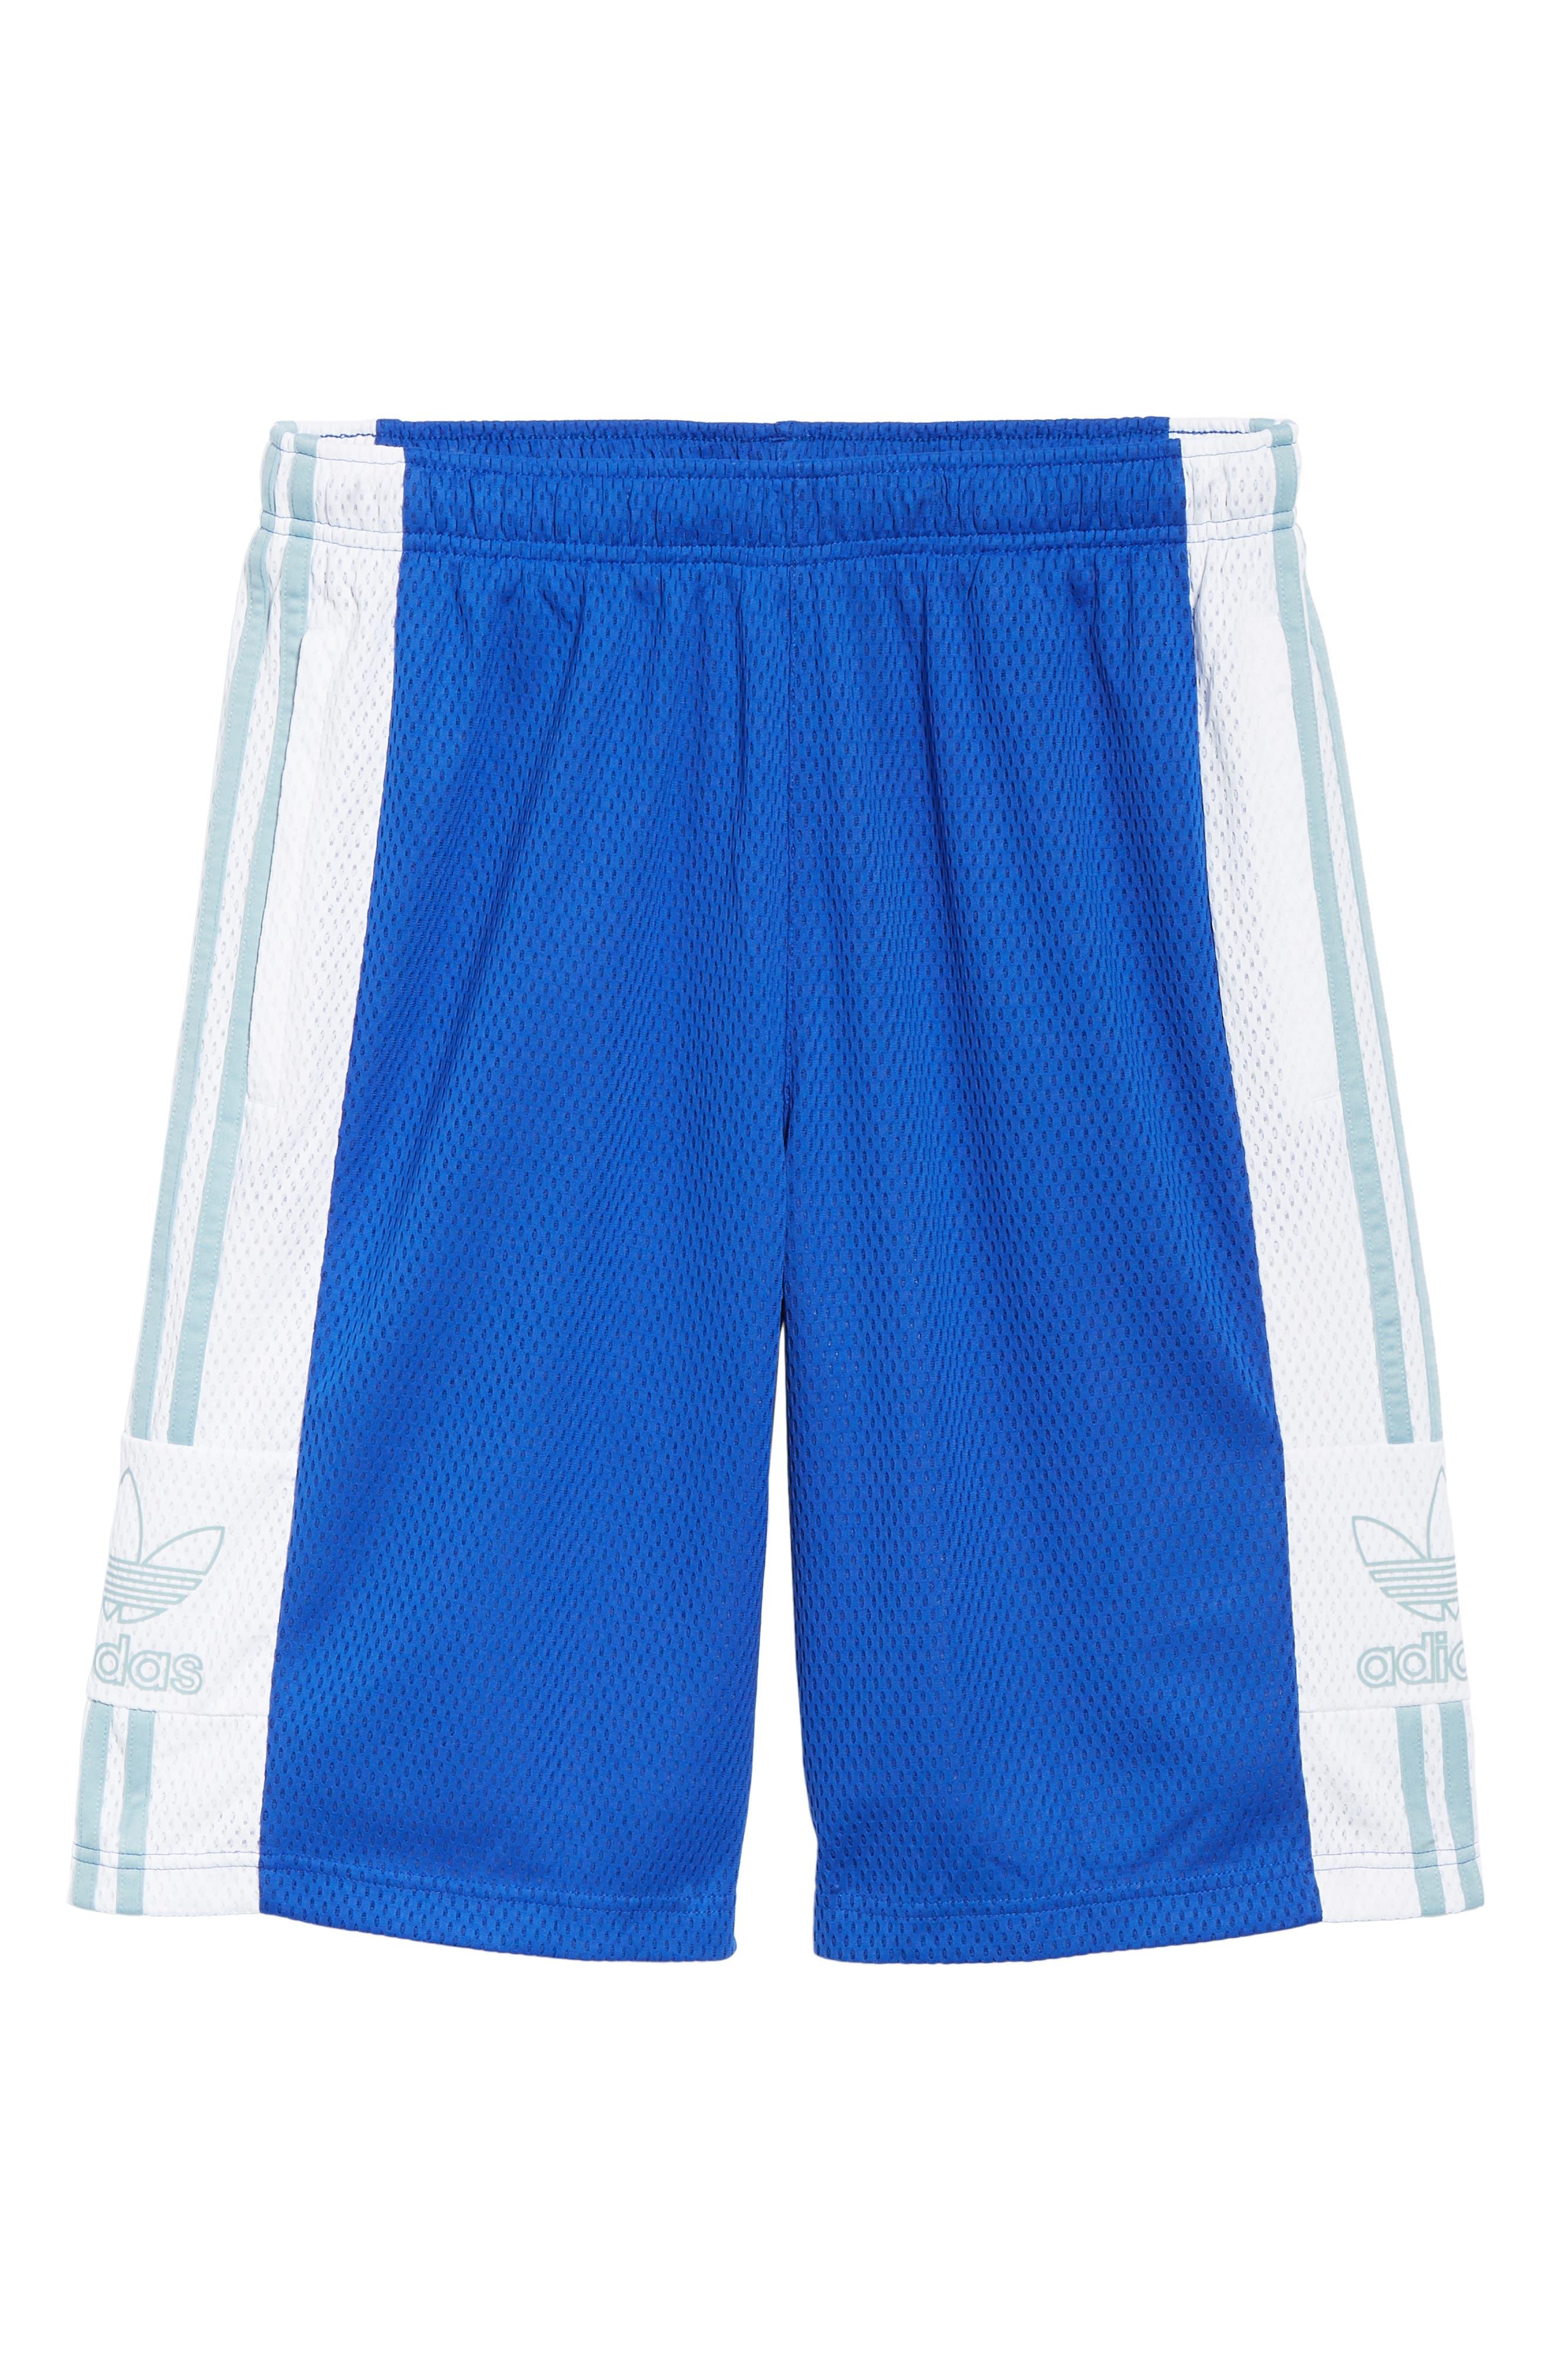 ADIDAS ORIGINALS, Mesh Athletic Shorts, Alternate thumbnail 6, color, BOLD BLUE/ WHITE